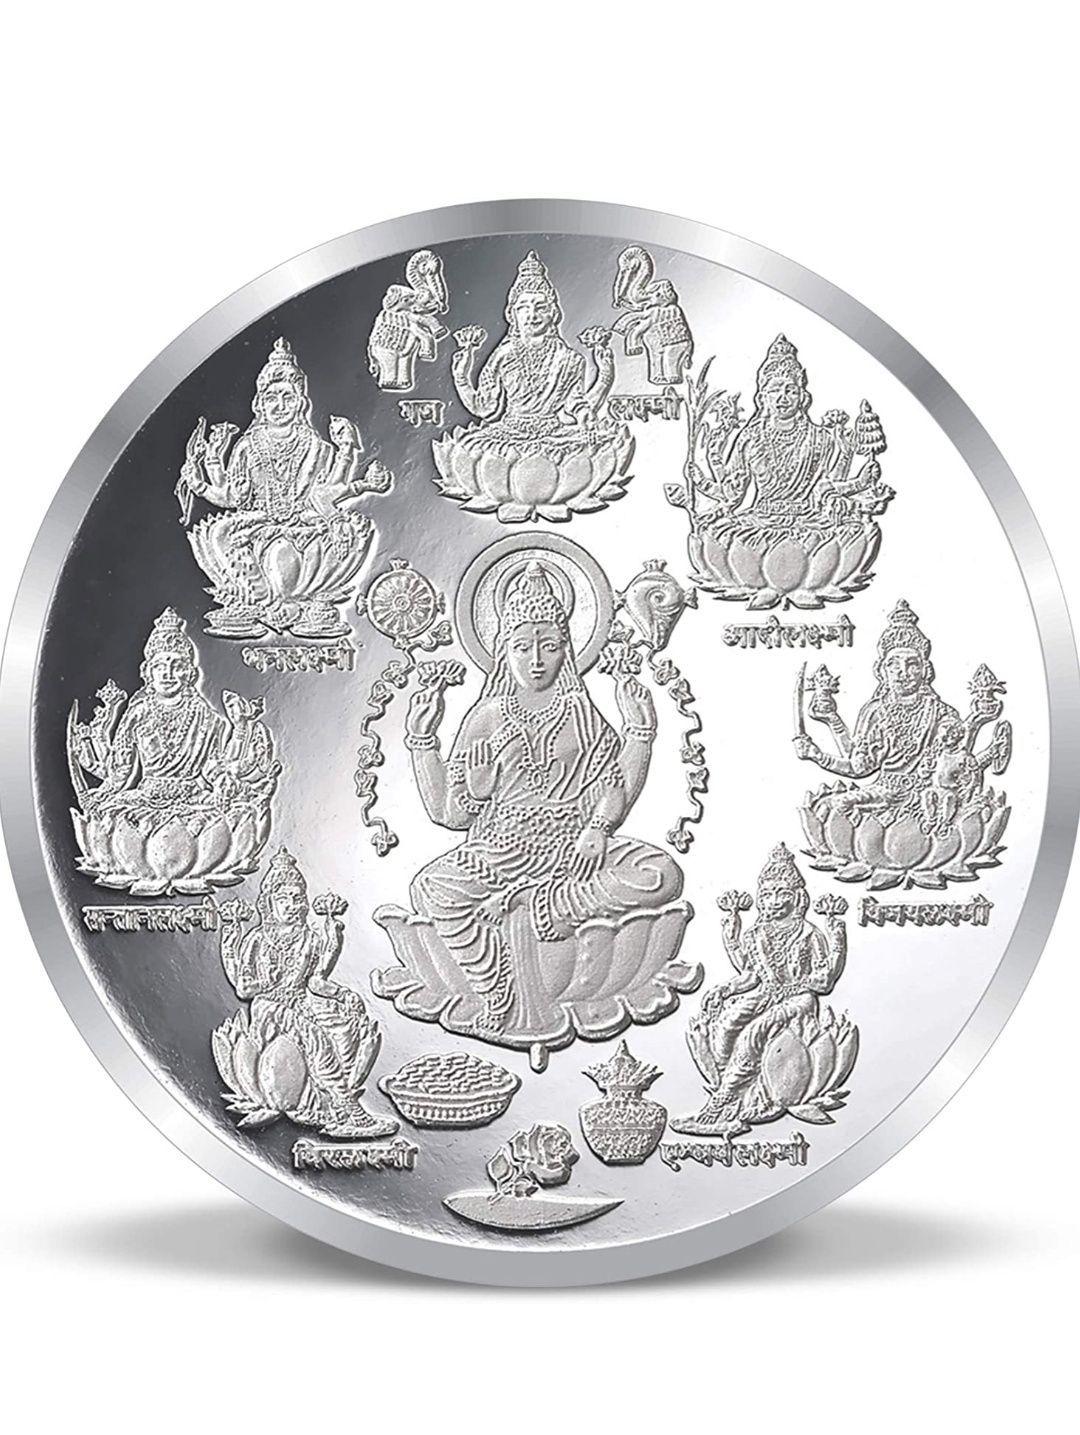 Silver ashtlaxmi coin pure silver ashtlaxmi coin 20gm 999purity